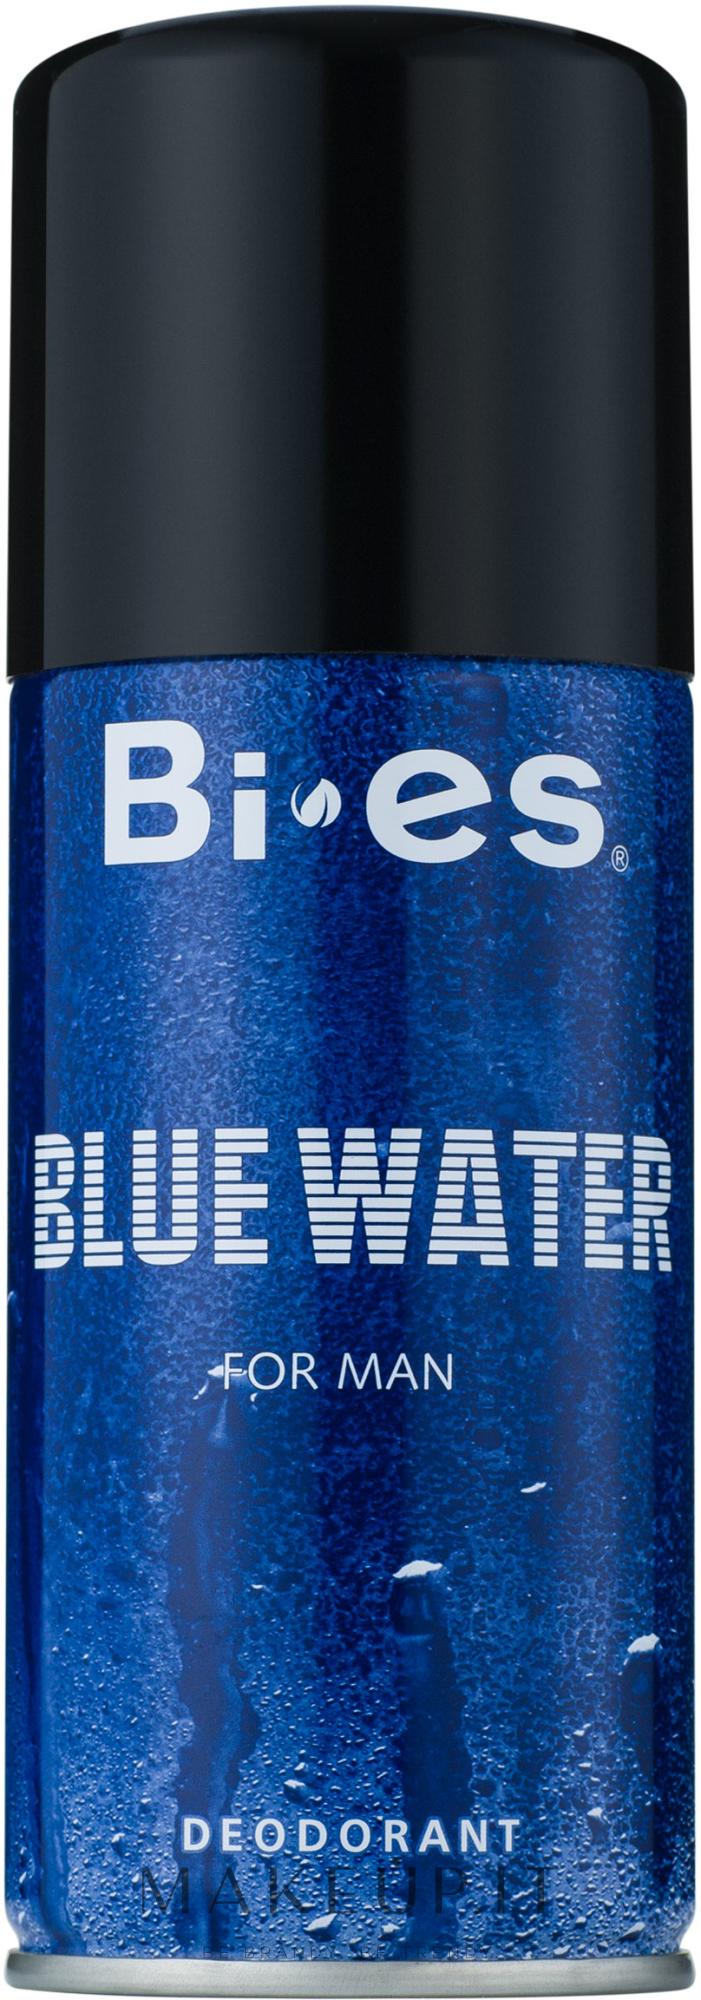 Bi-Es Blue Water Men - Deodorante — foto 150 ml